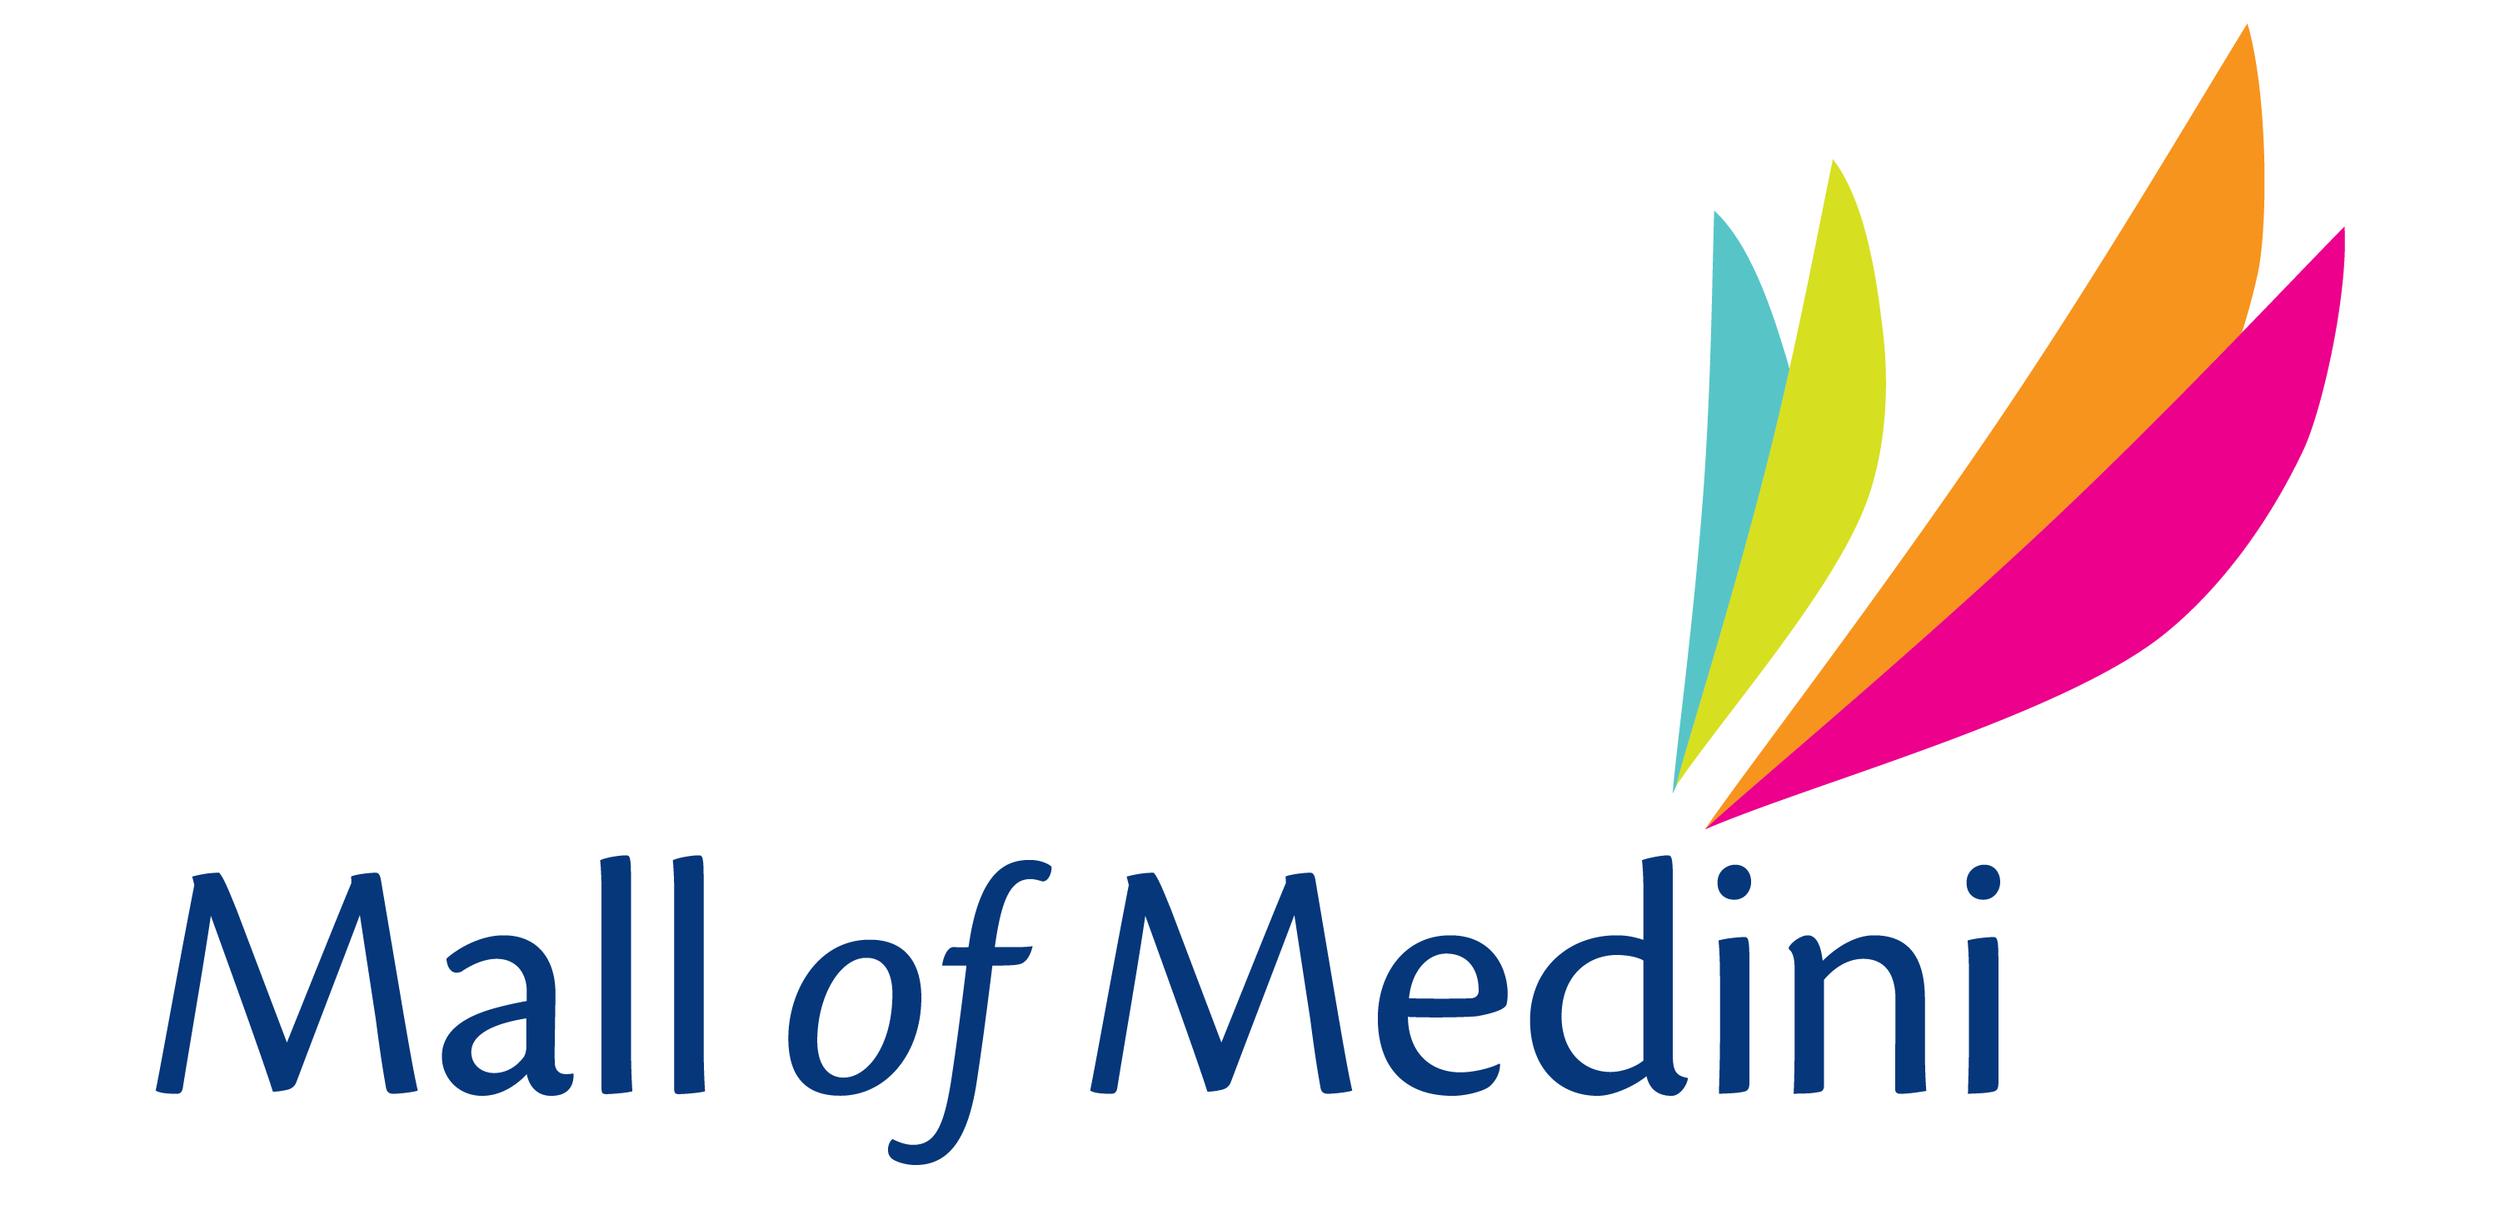 LO4c_Mall of Medini_Primary (o).png